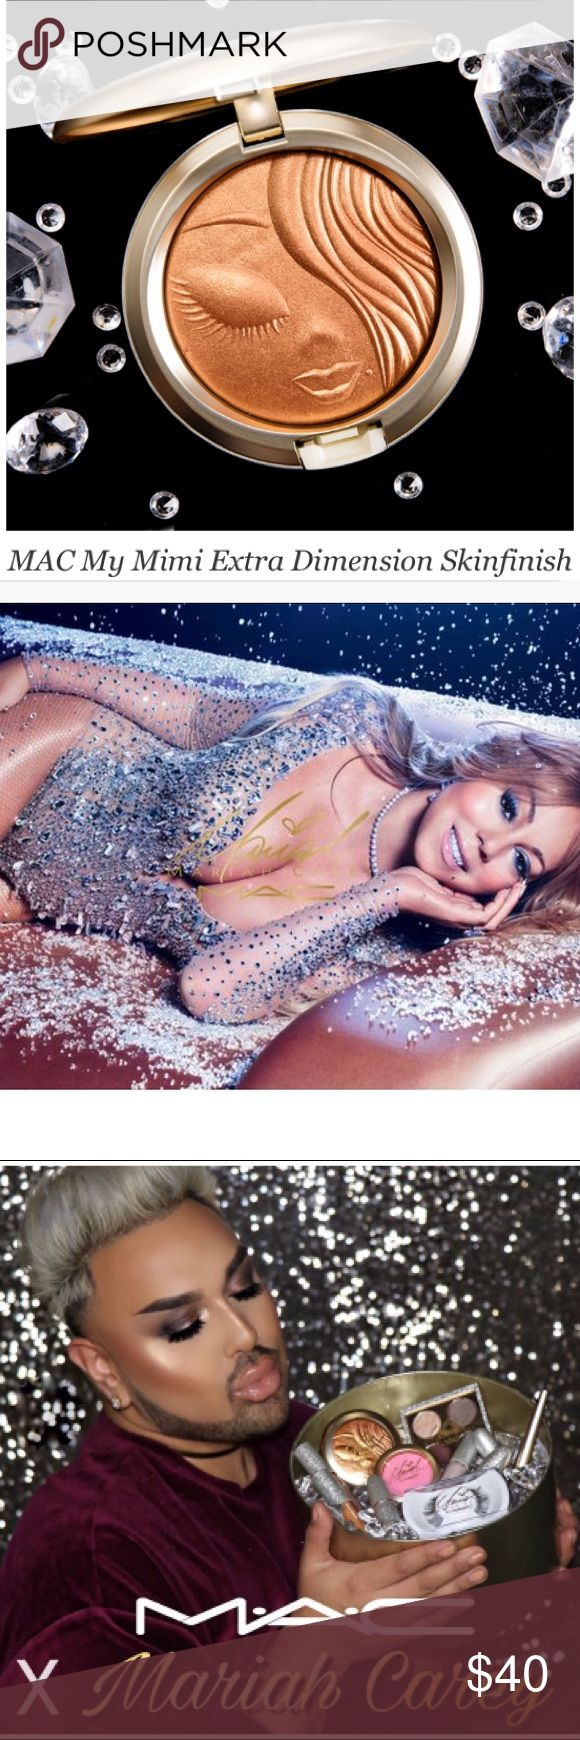 LE MAC x Mariah Carey Extra Dimension Skinfinish Authentic